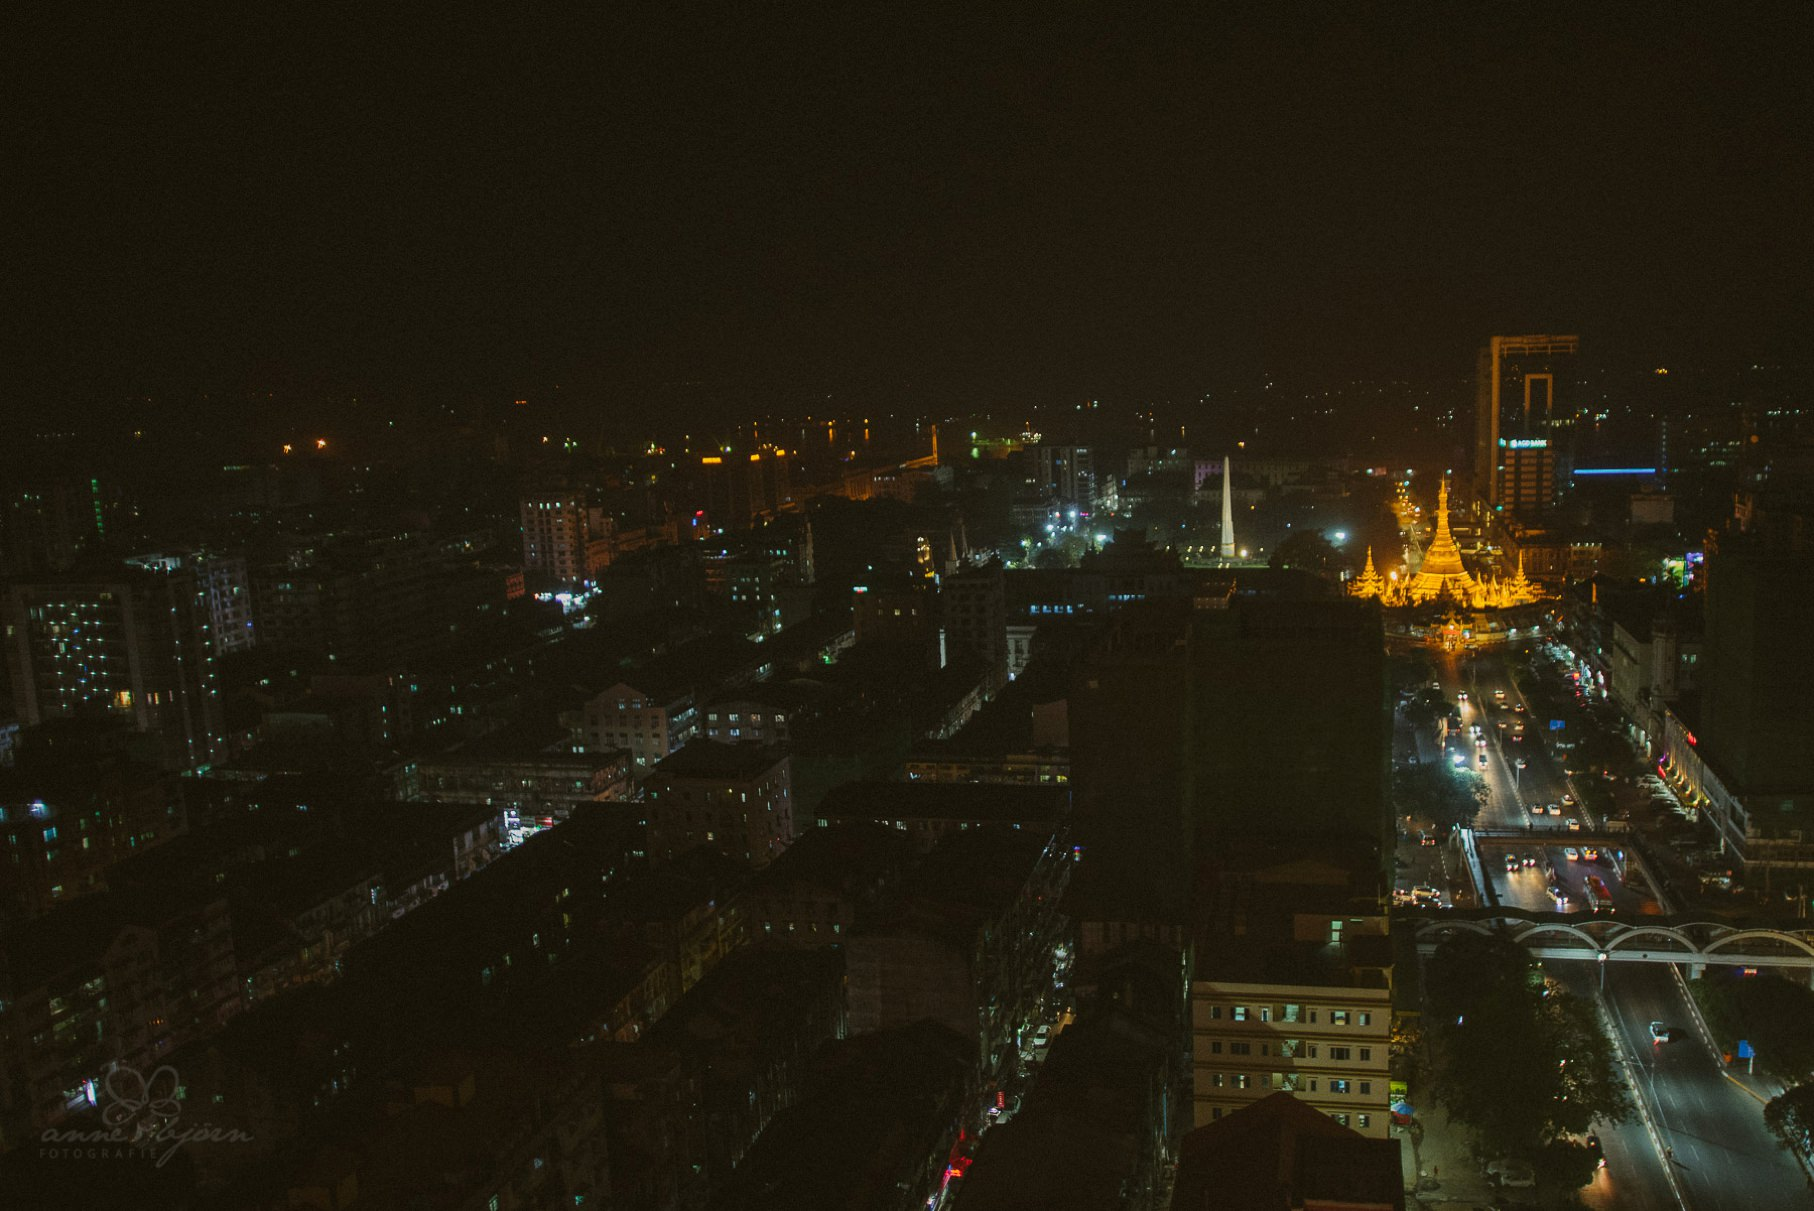 0033 yangon mandalay d76 4935 - Großstädte Myanmars - Yangon & Mandalay